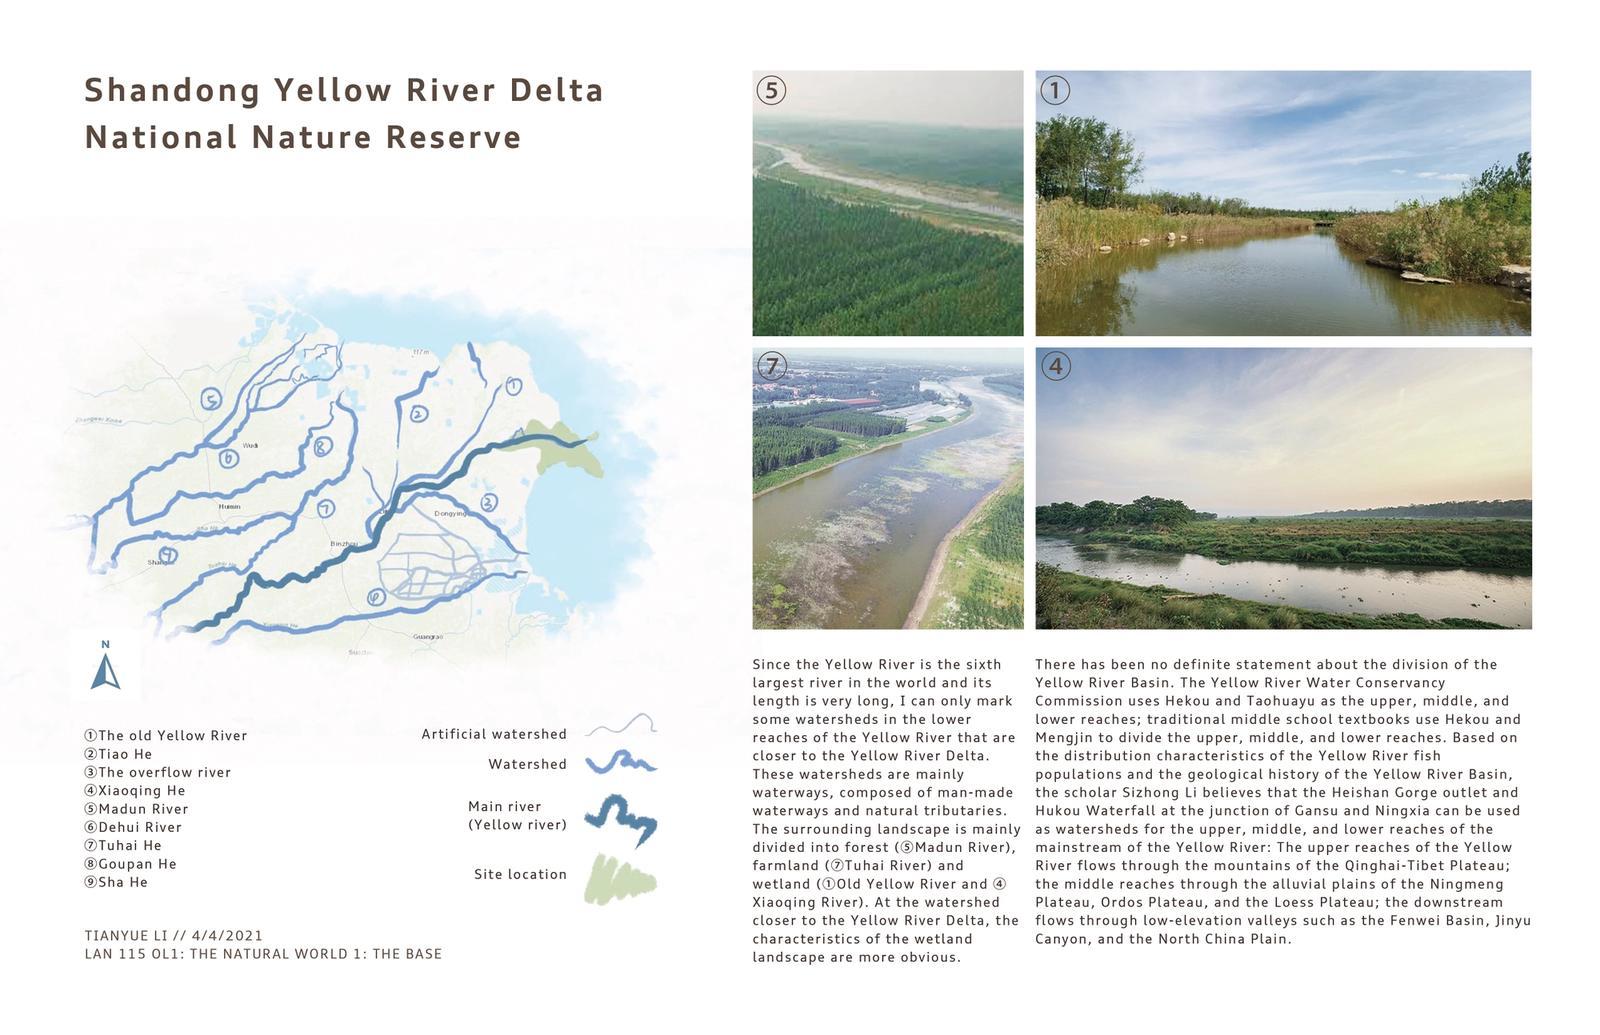 Shandong Yellow River Delta National Nature Reserve 2